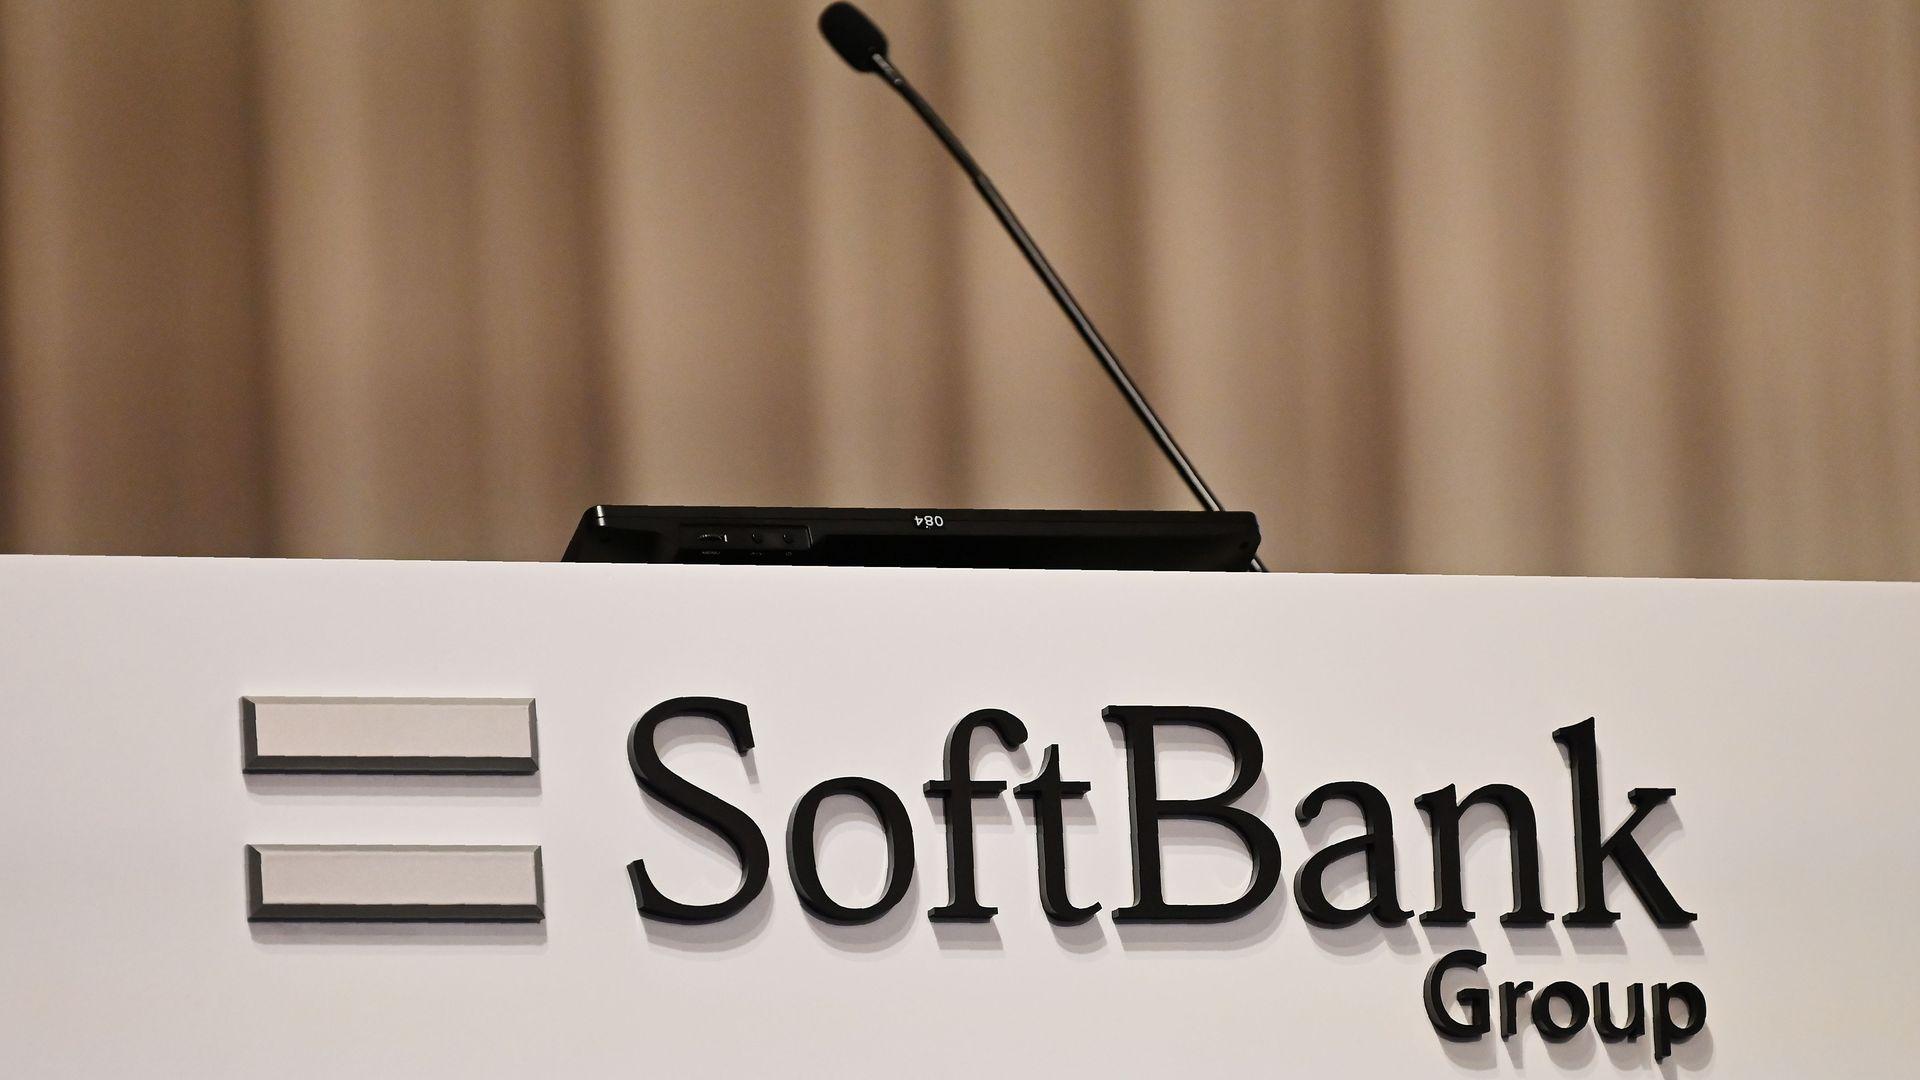 The SoftBank Group logo.